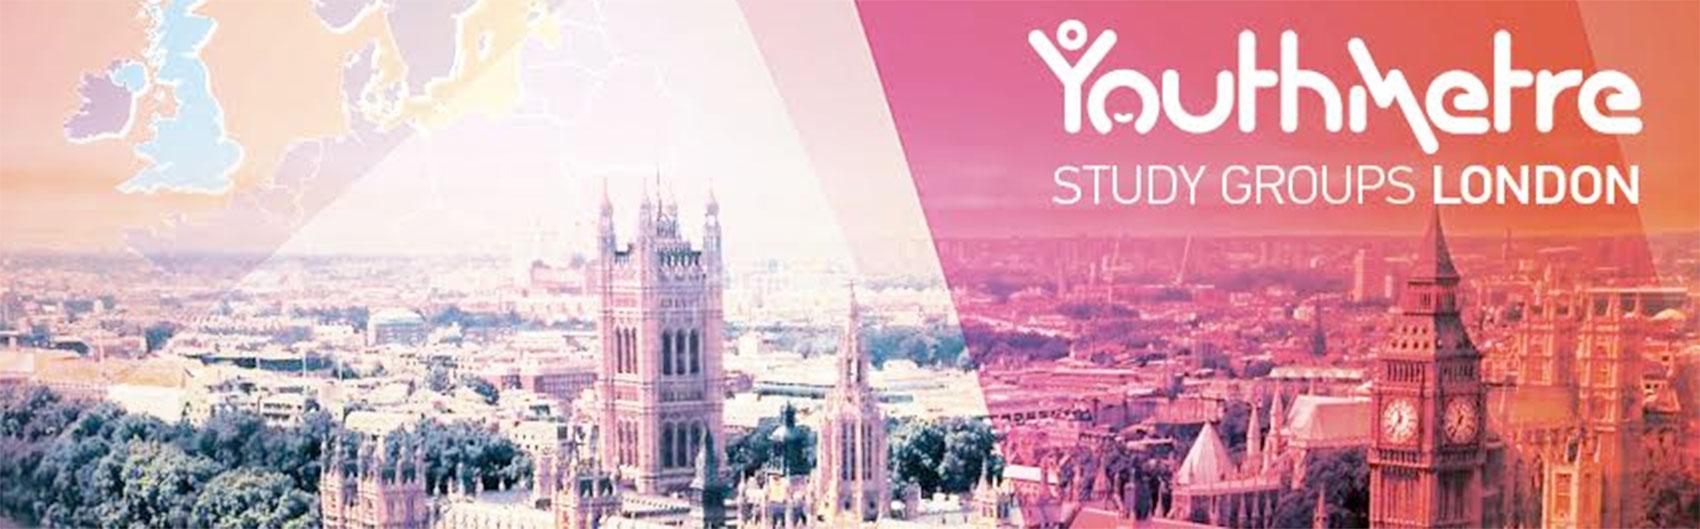 YouthMetre Study Group, London